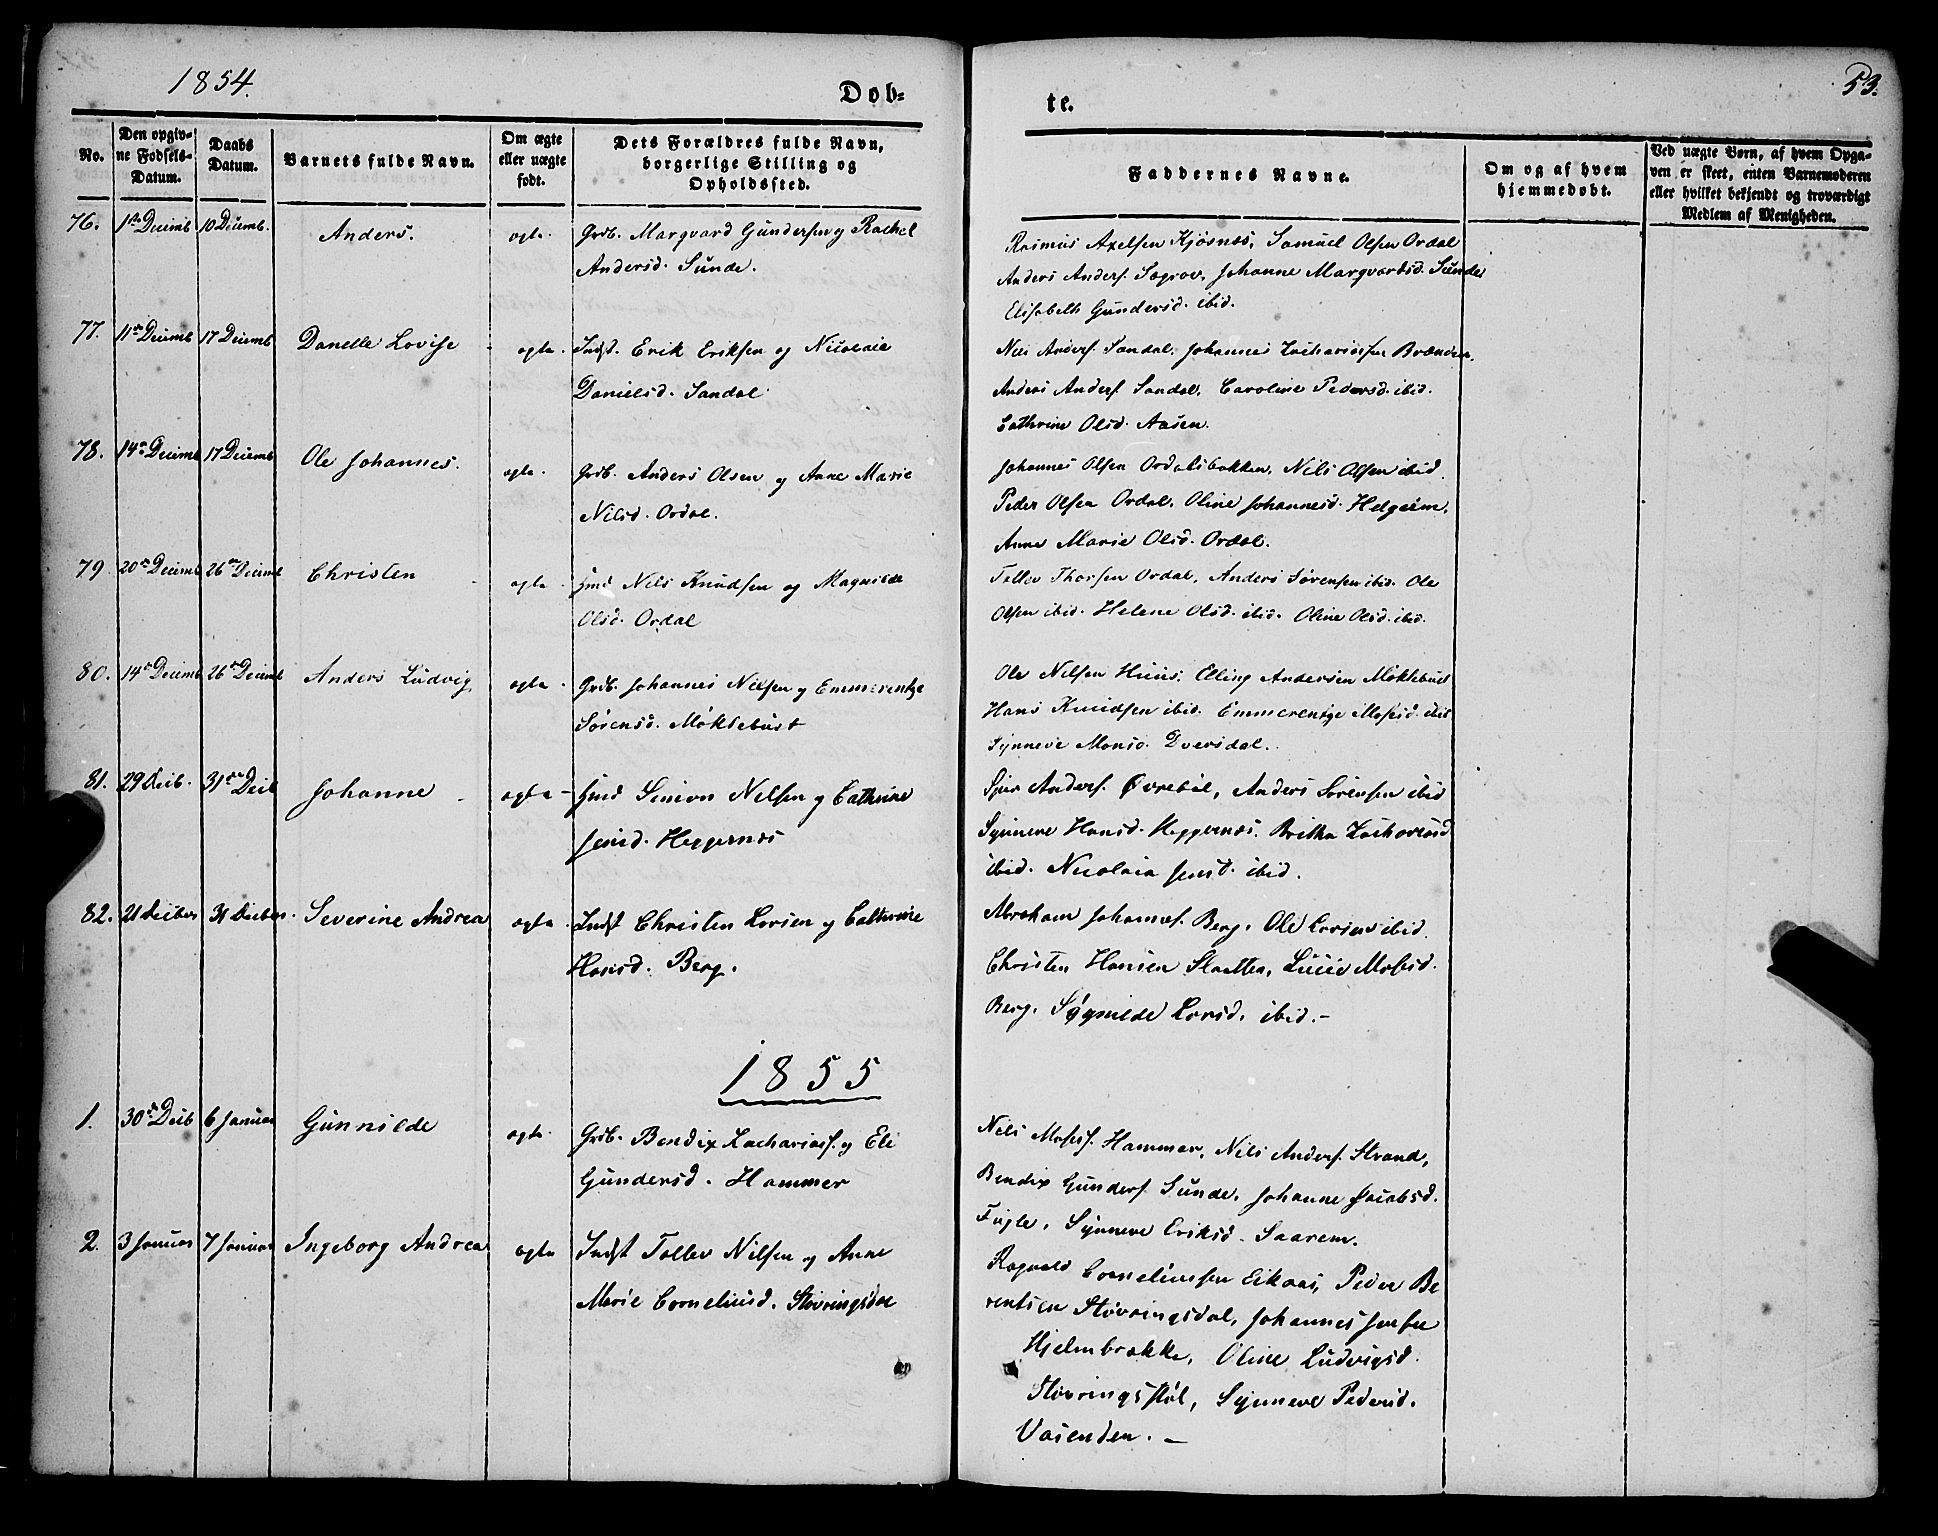 SAB, Jølster sokneprestembete, H/Haa/Haaa/L0010: Parish register (official) no. A 10, 1847-1865, p. 53